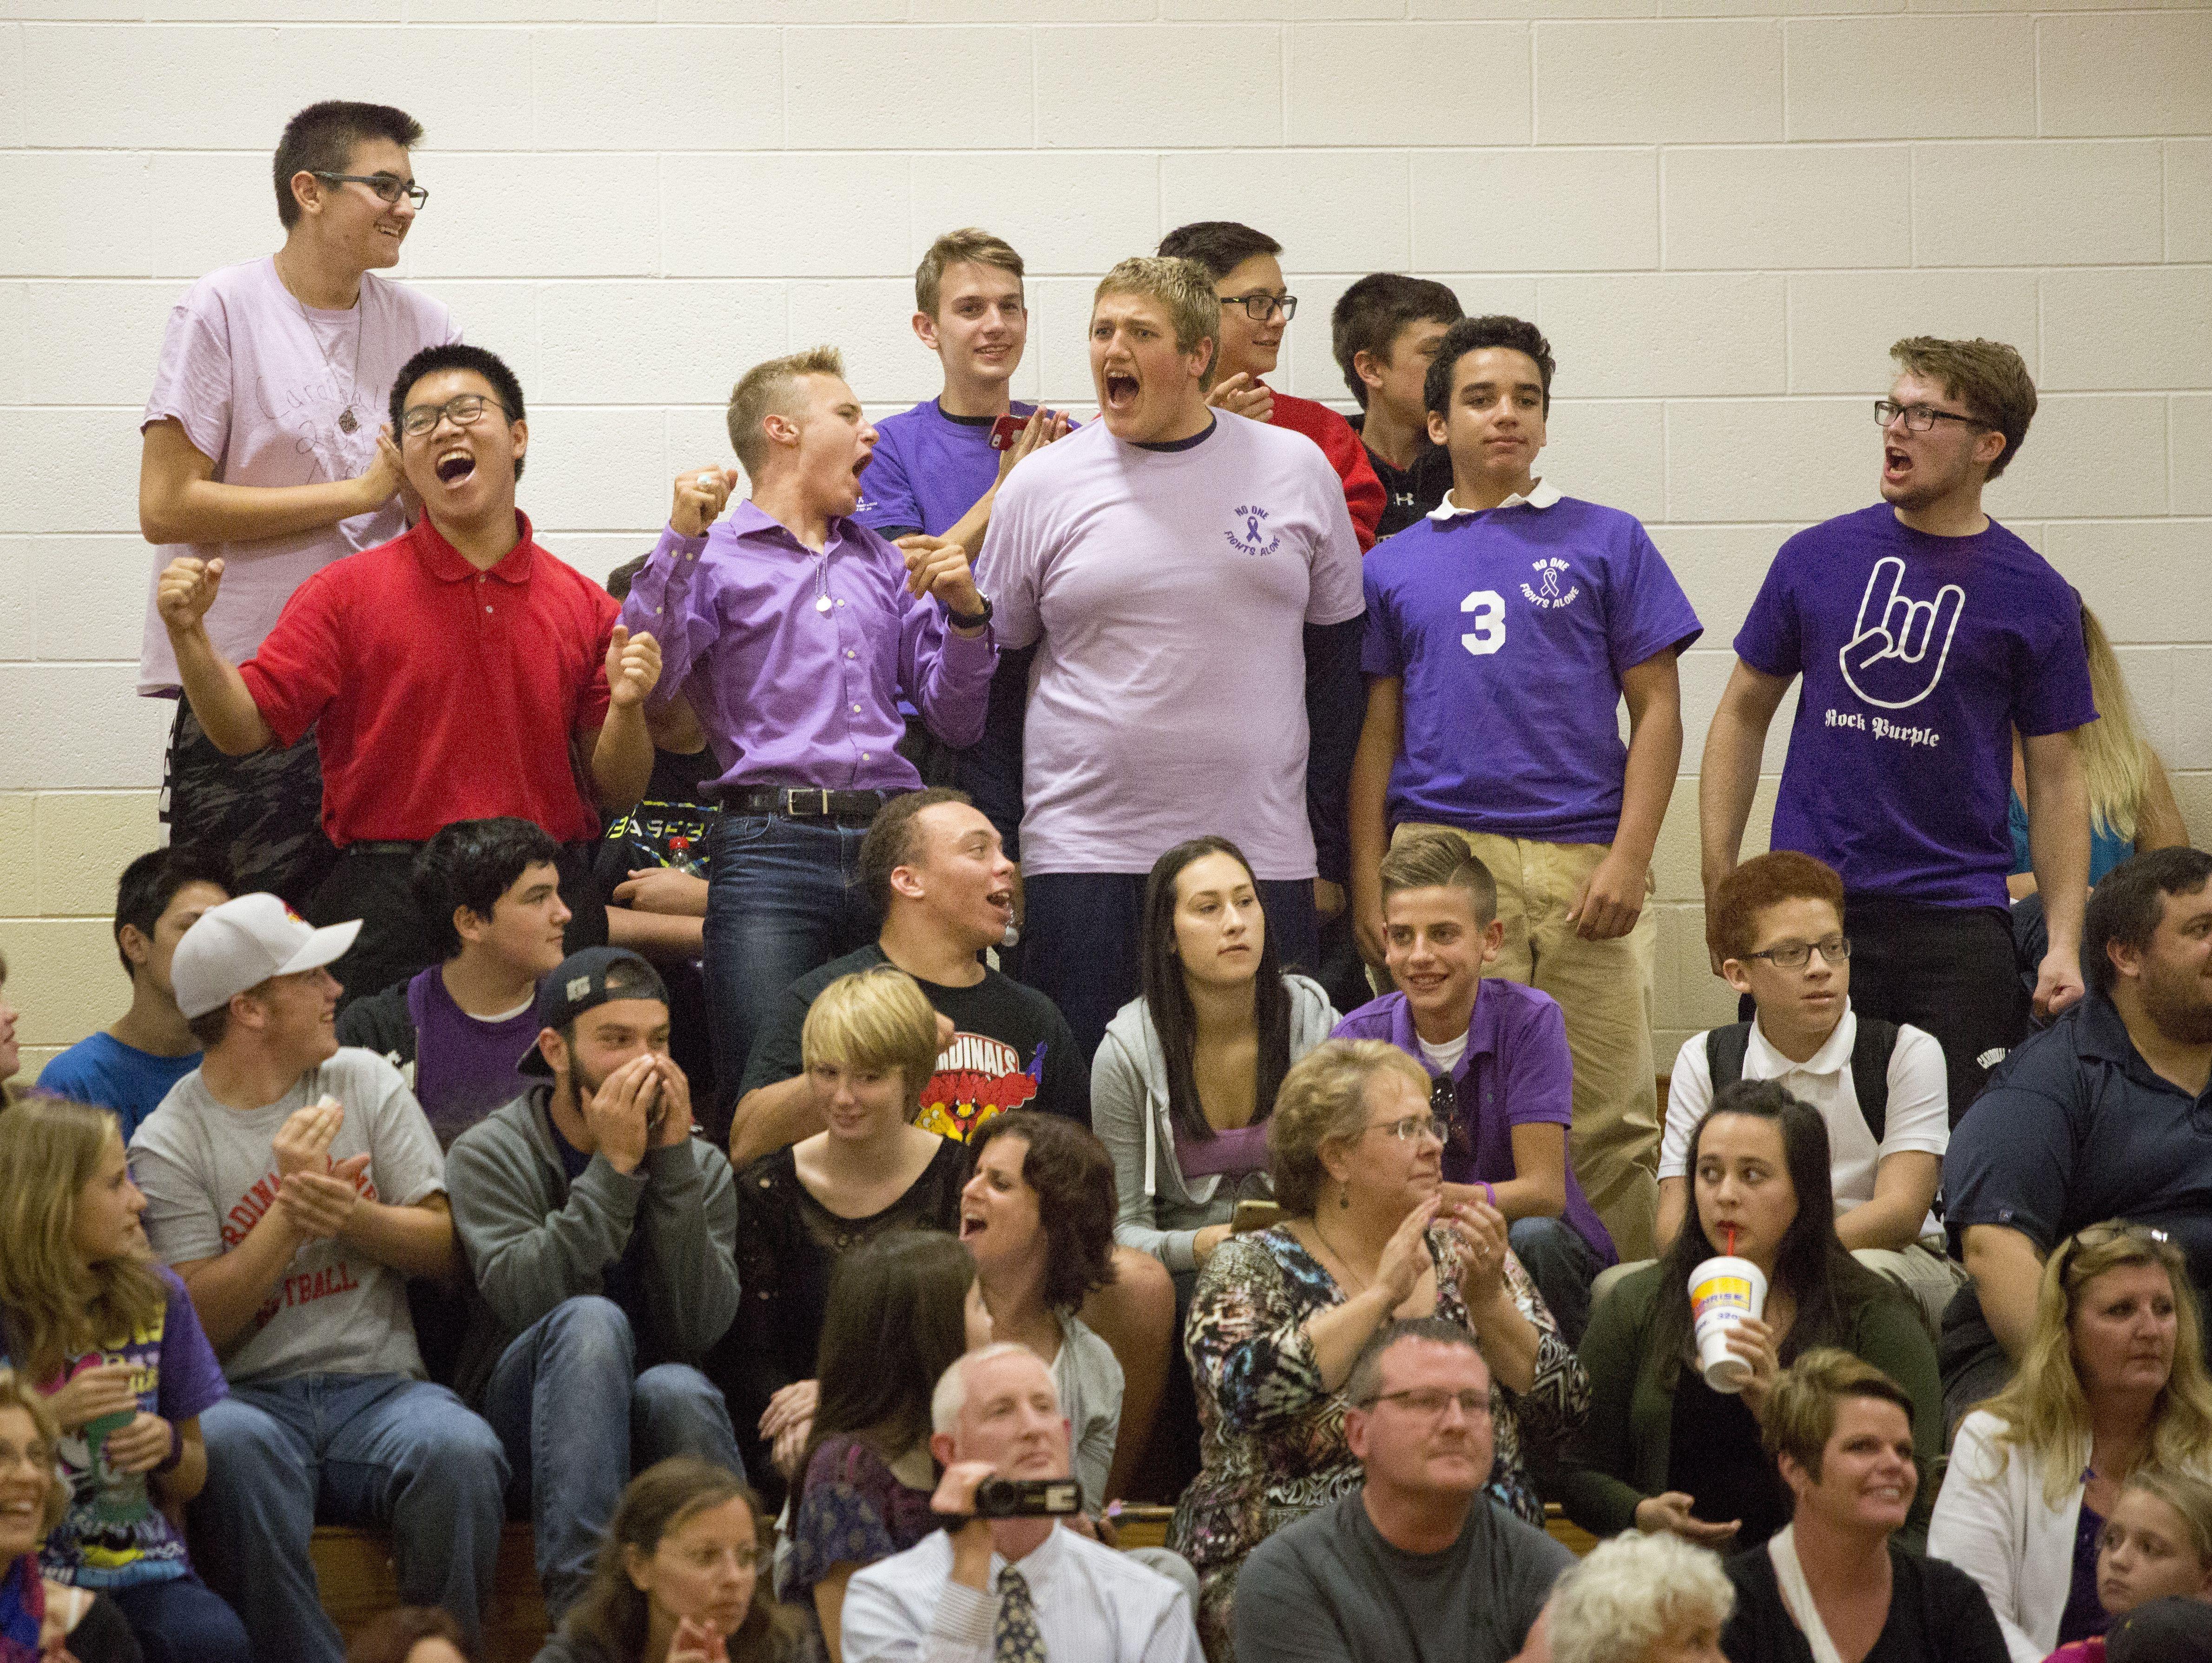 Cardinal Mooney fans cheer during a volleyball game Wednesday, Oct. 5, 2016 at Cardinal Mooney High School.